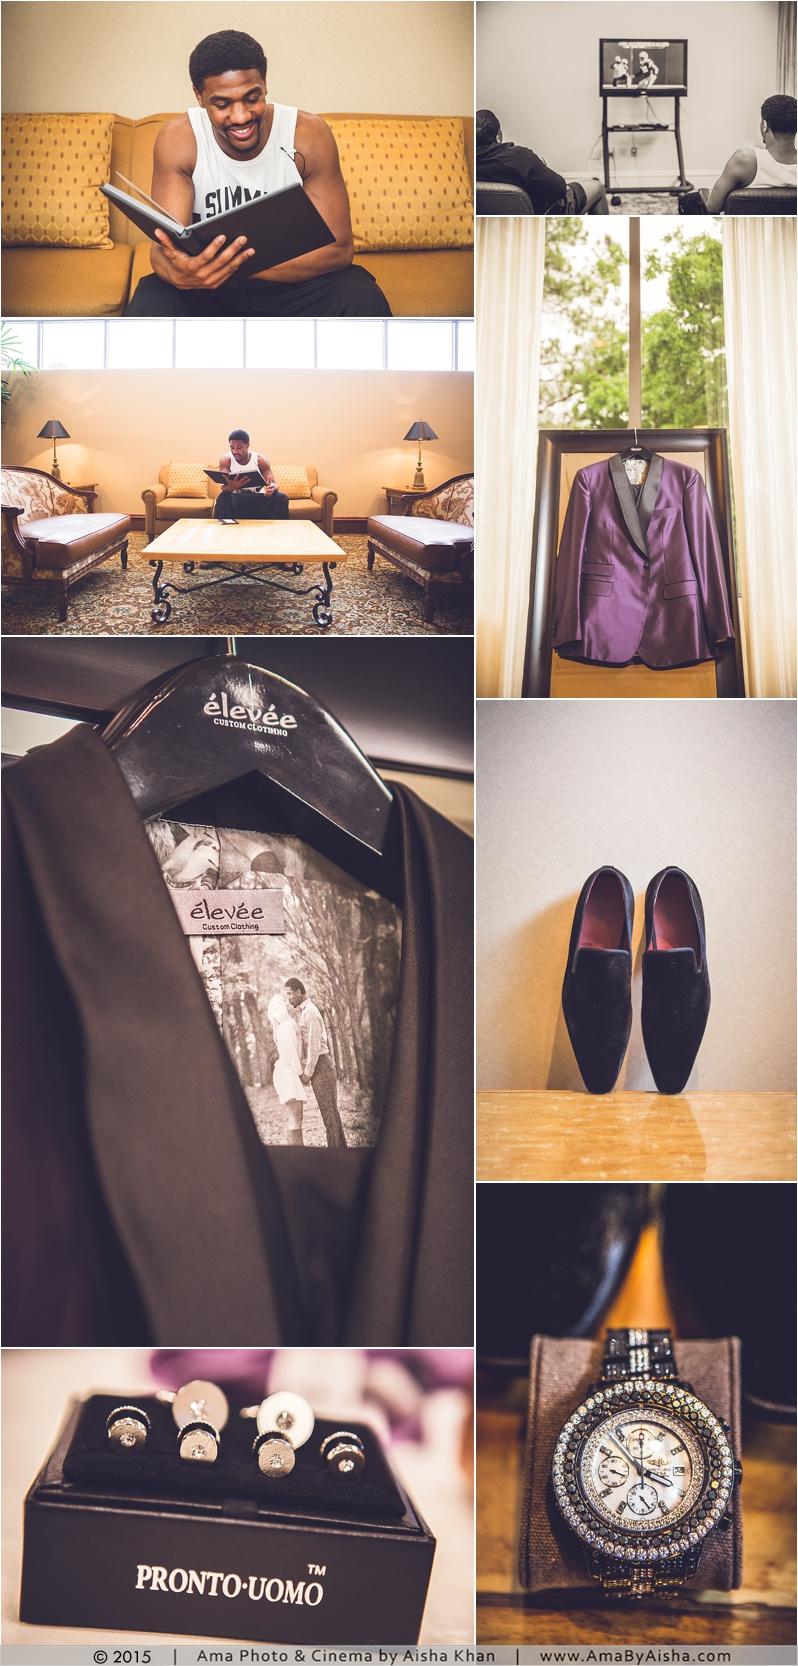 ©2015   www.AmaByAisha.com   Groom wedding detail photos